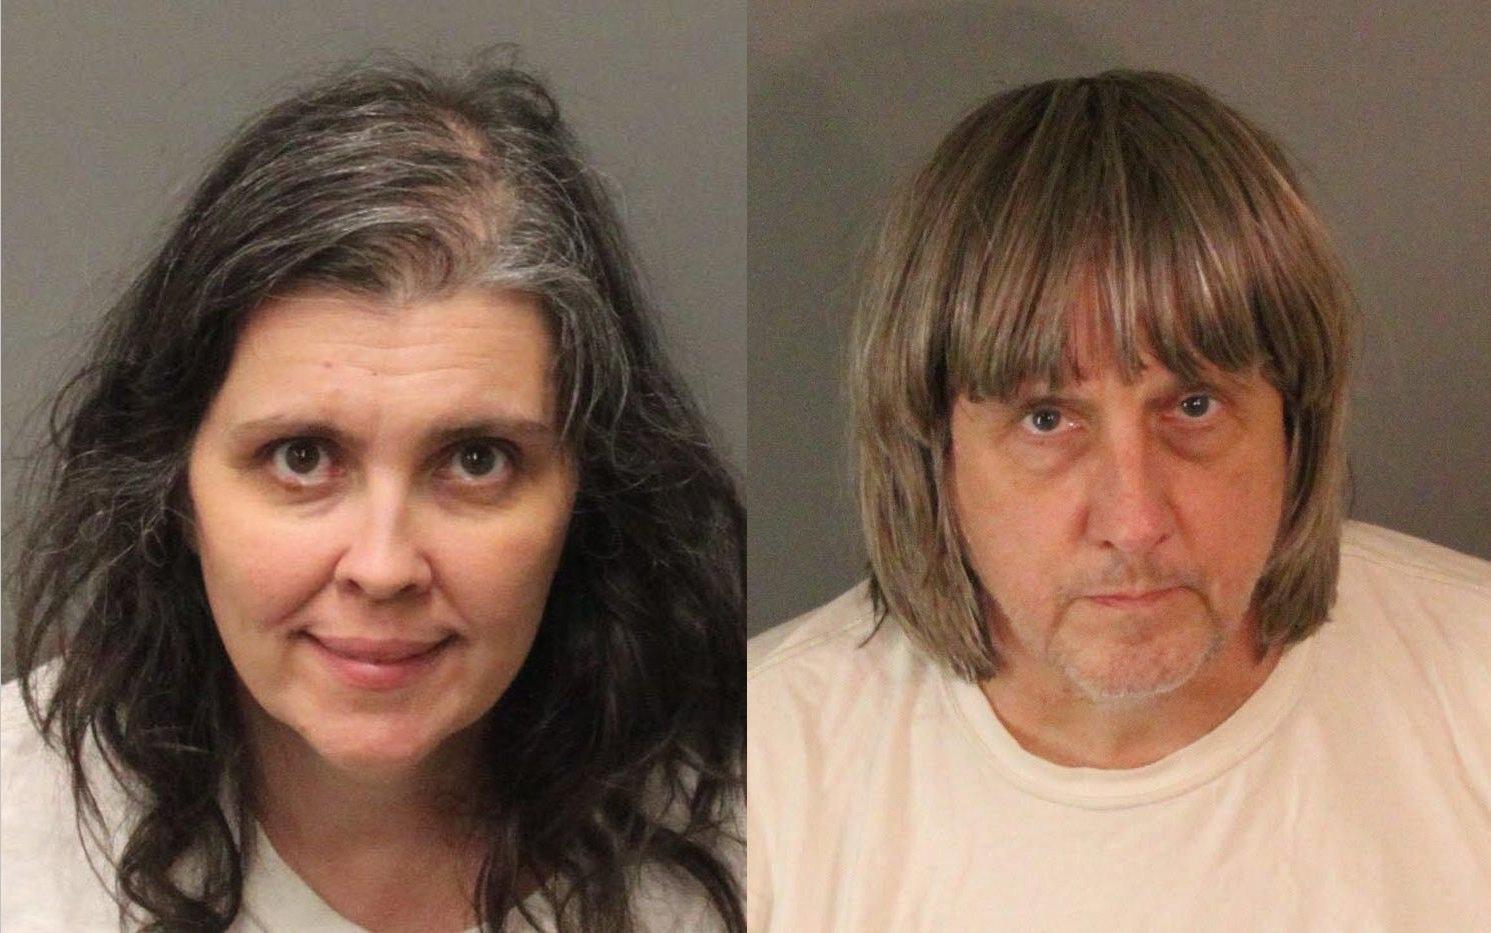 Genitori arrestati per aver tenuti prigionieri i figli in casa